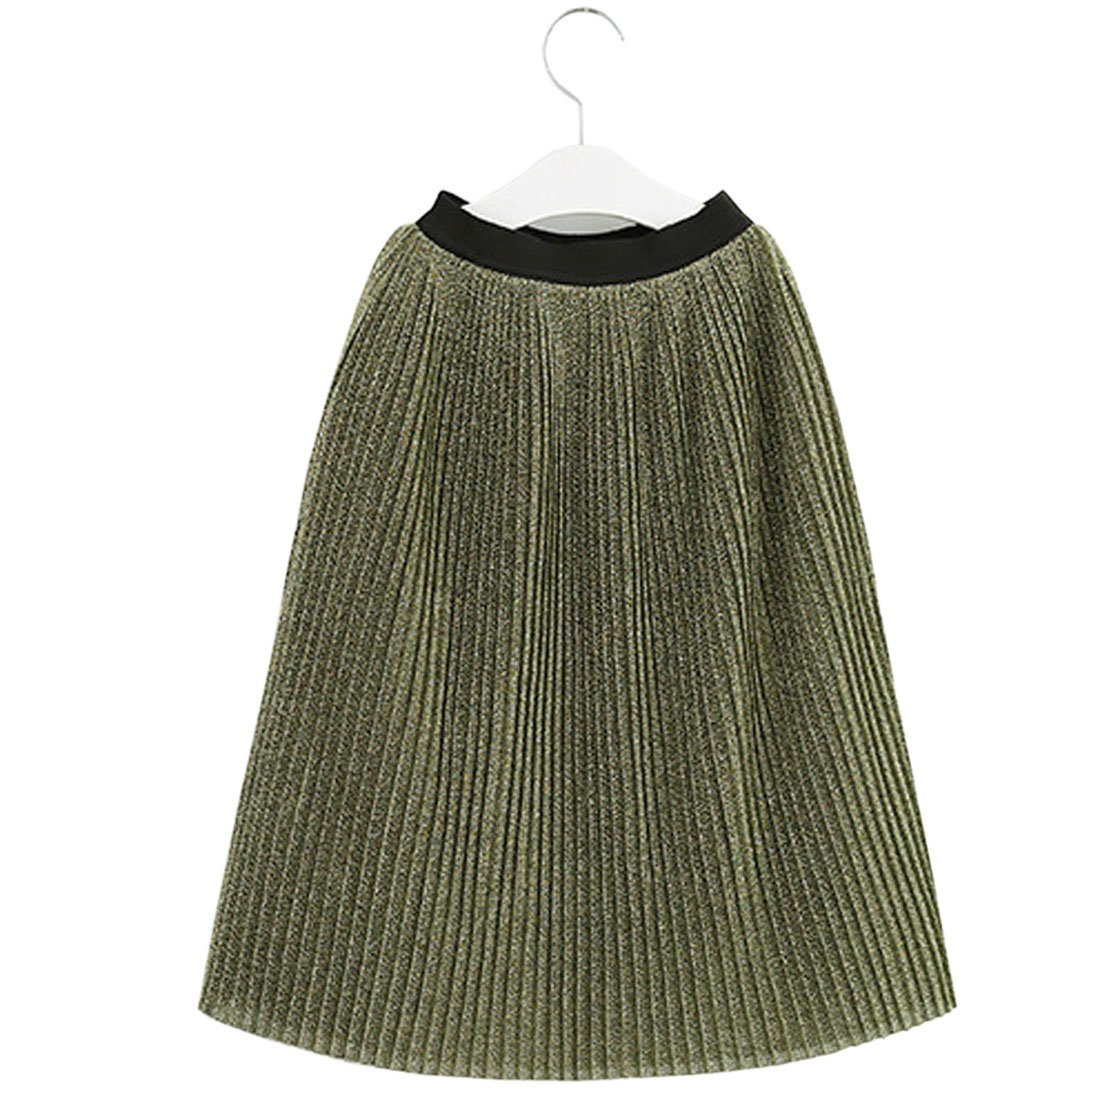 ACVIP Girl's Pleated Elastic Shimmering Metallic Medi Skirt Atrovirens (8-9 Years)